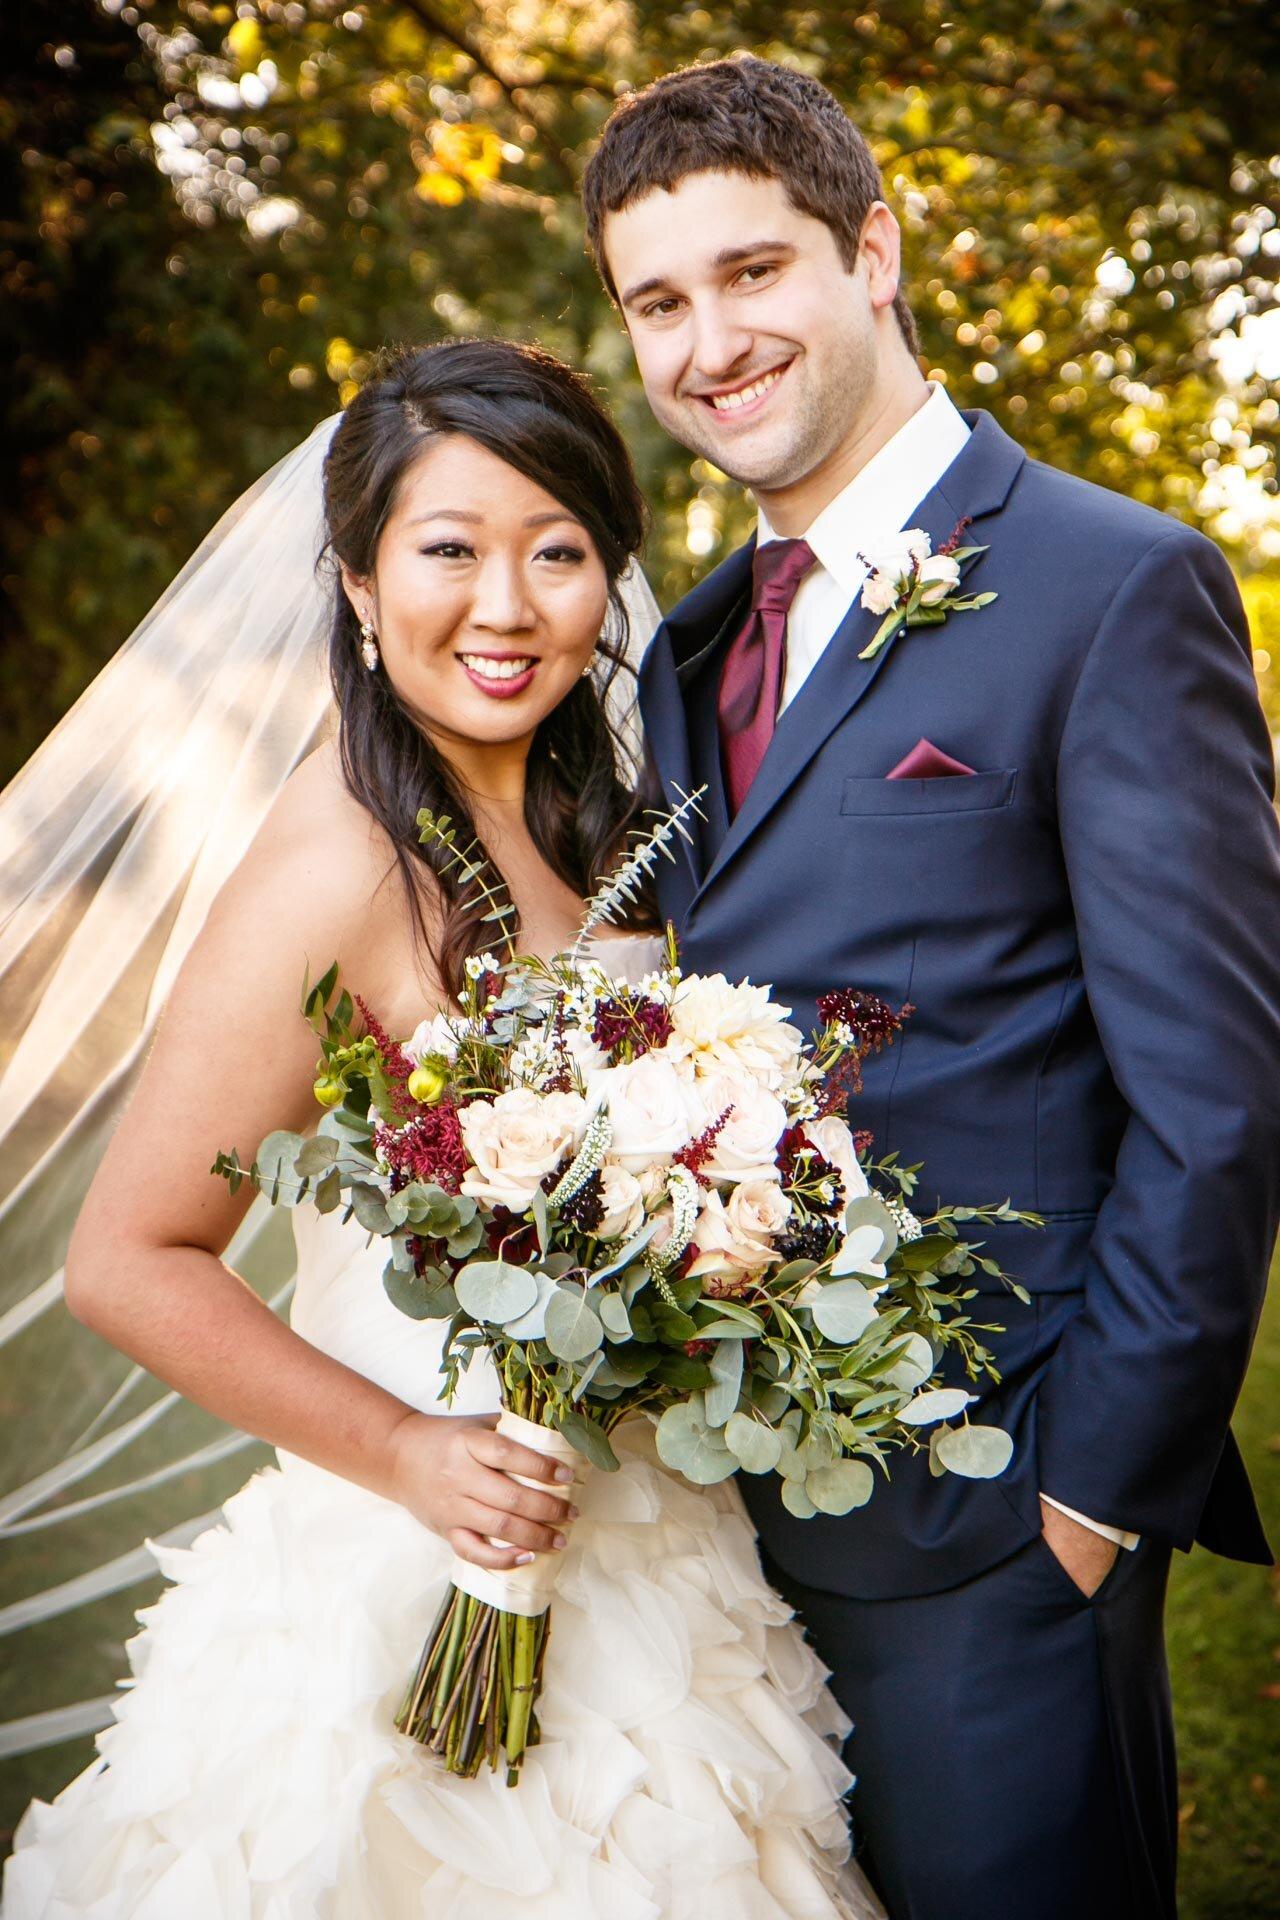 adam-shea-photography-fall-autumn-lighting-engagement-wedding-photos-adam-shea-photography-green-bay-appleton-neenah-photographer-16.jpg